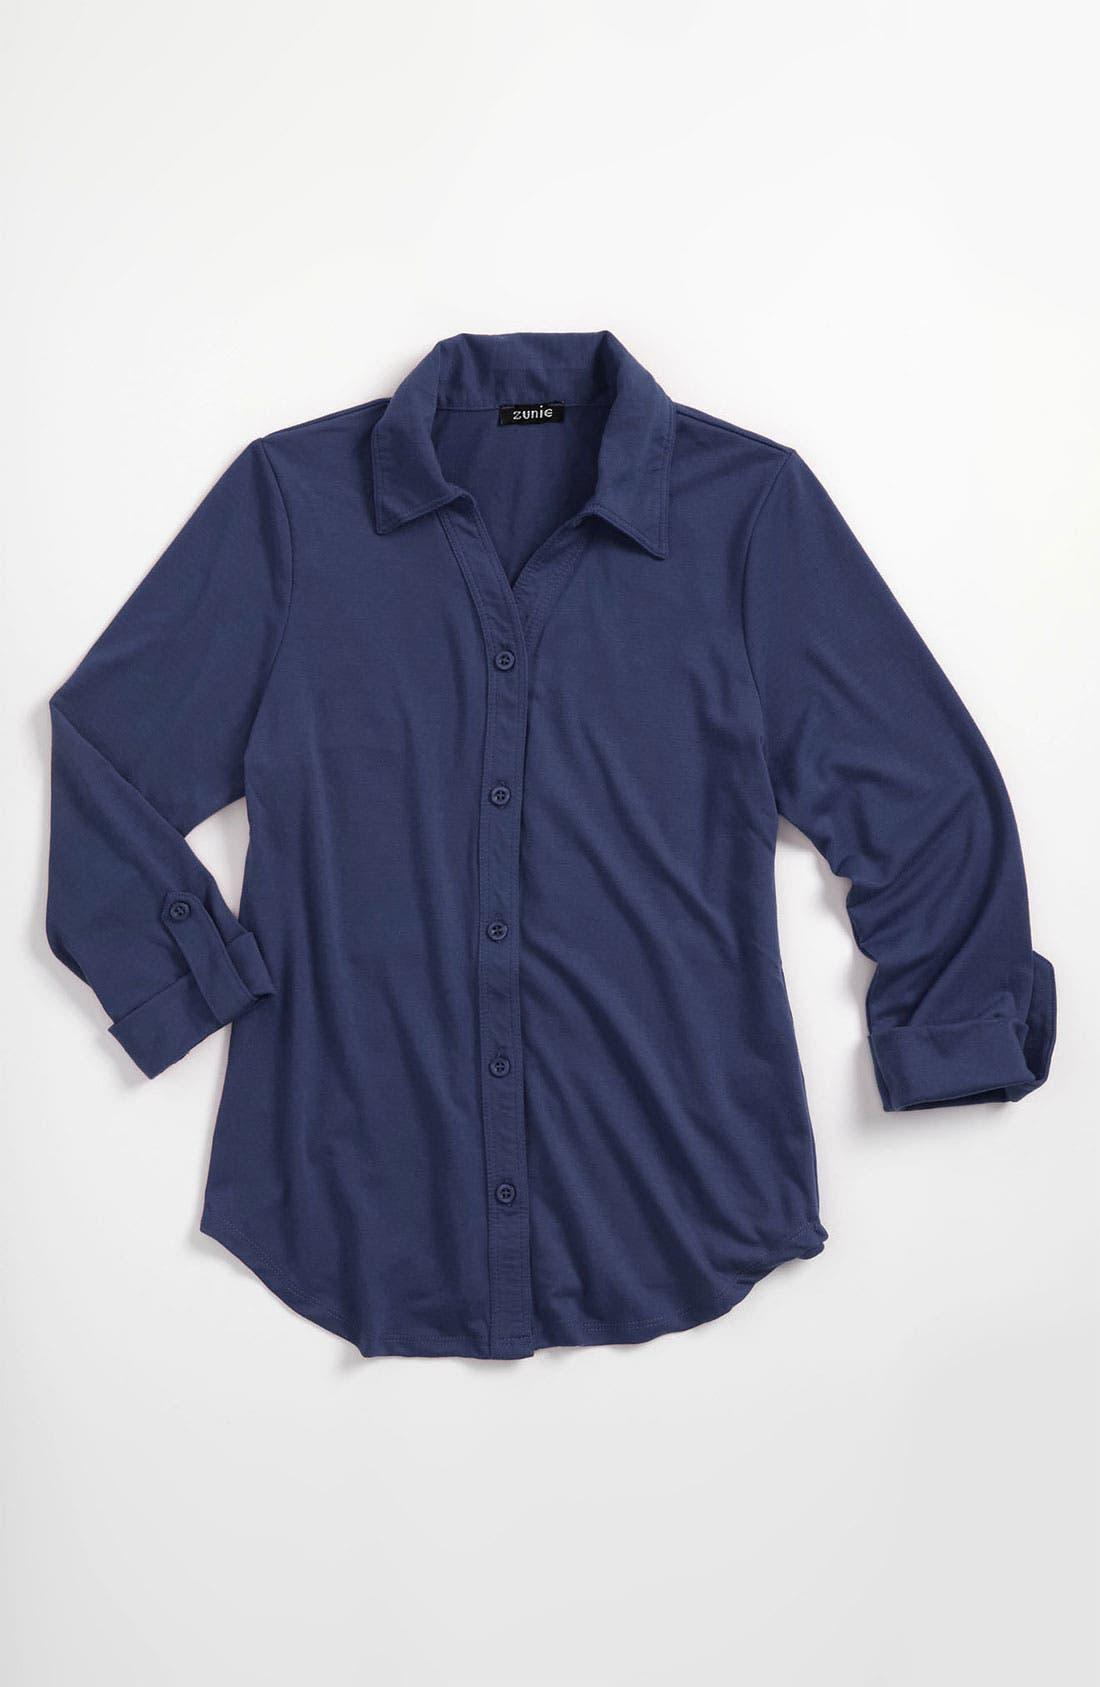 Main Image - Zunie Button Front Knit Shirt (Big Girls)